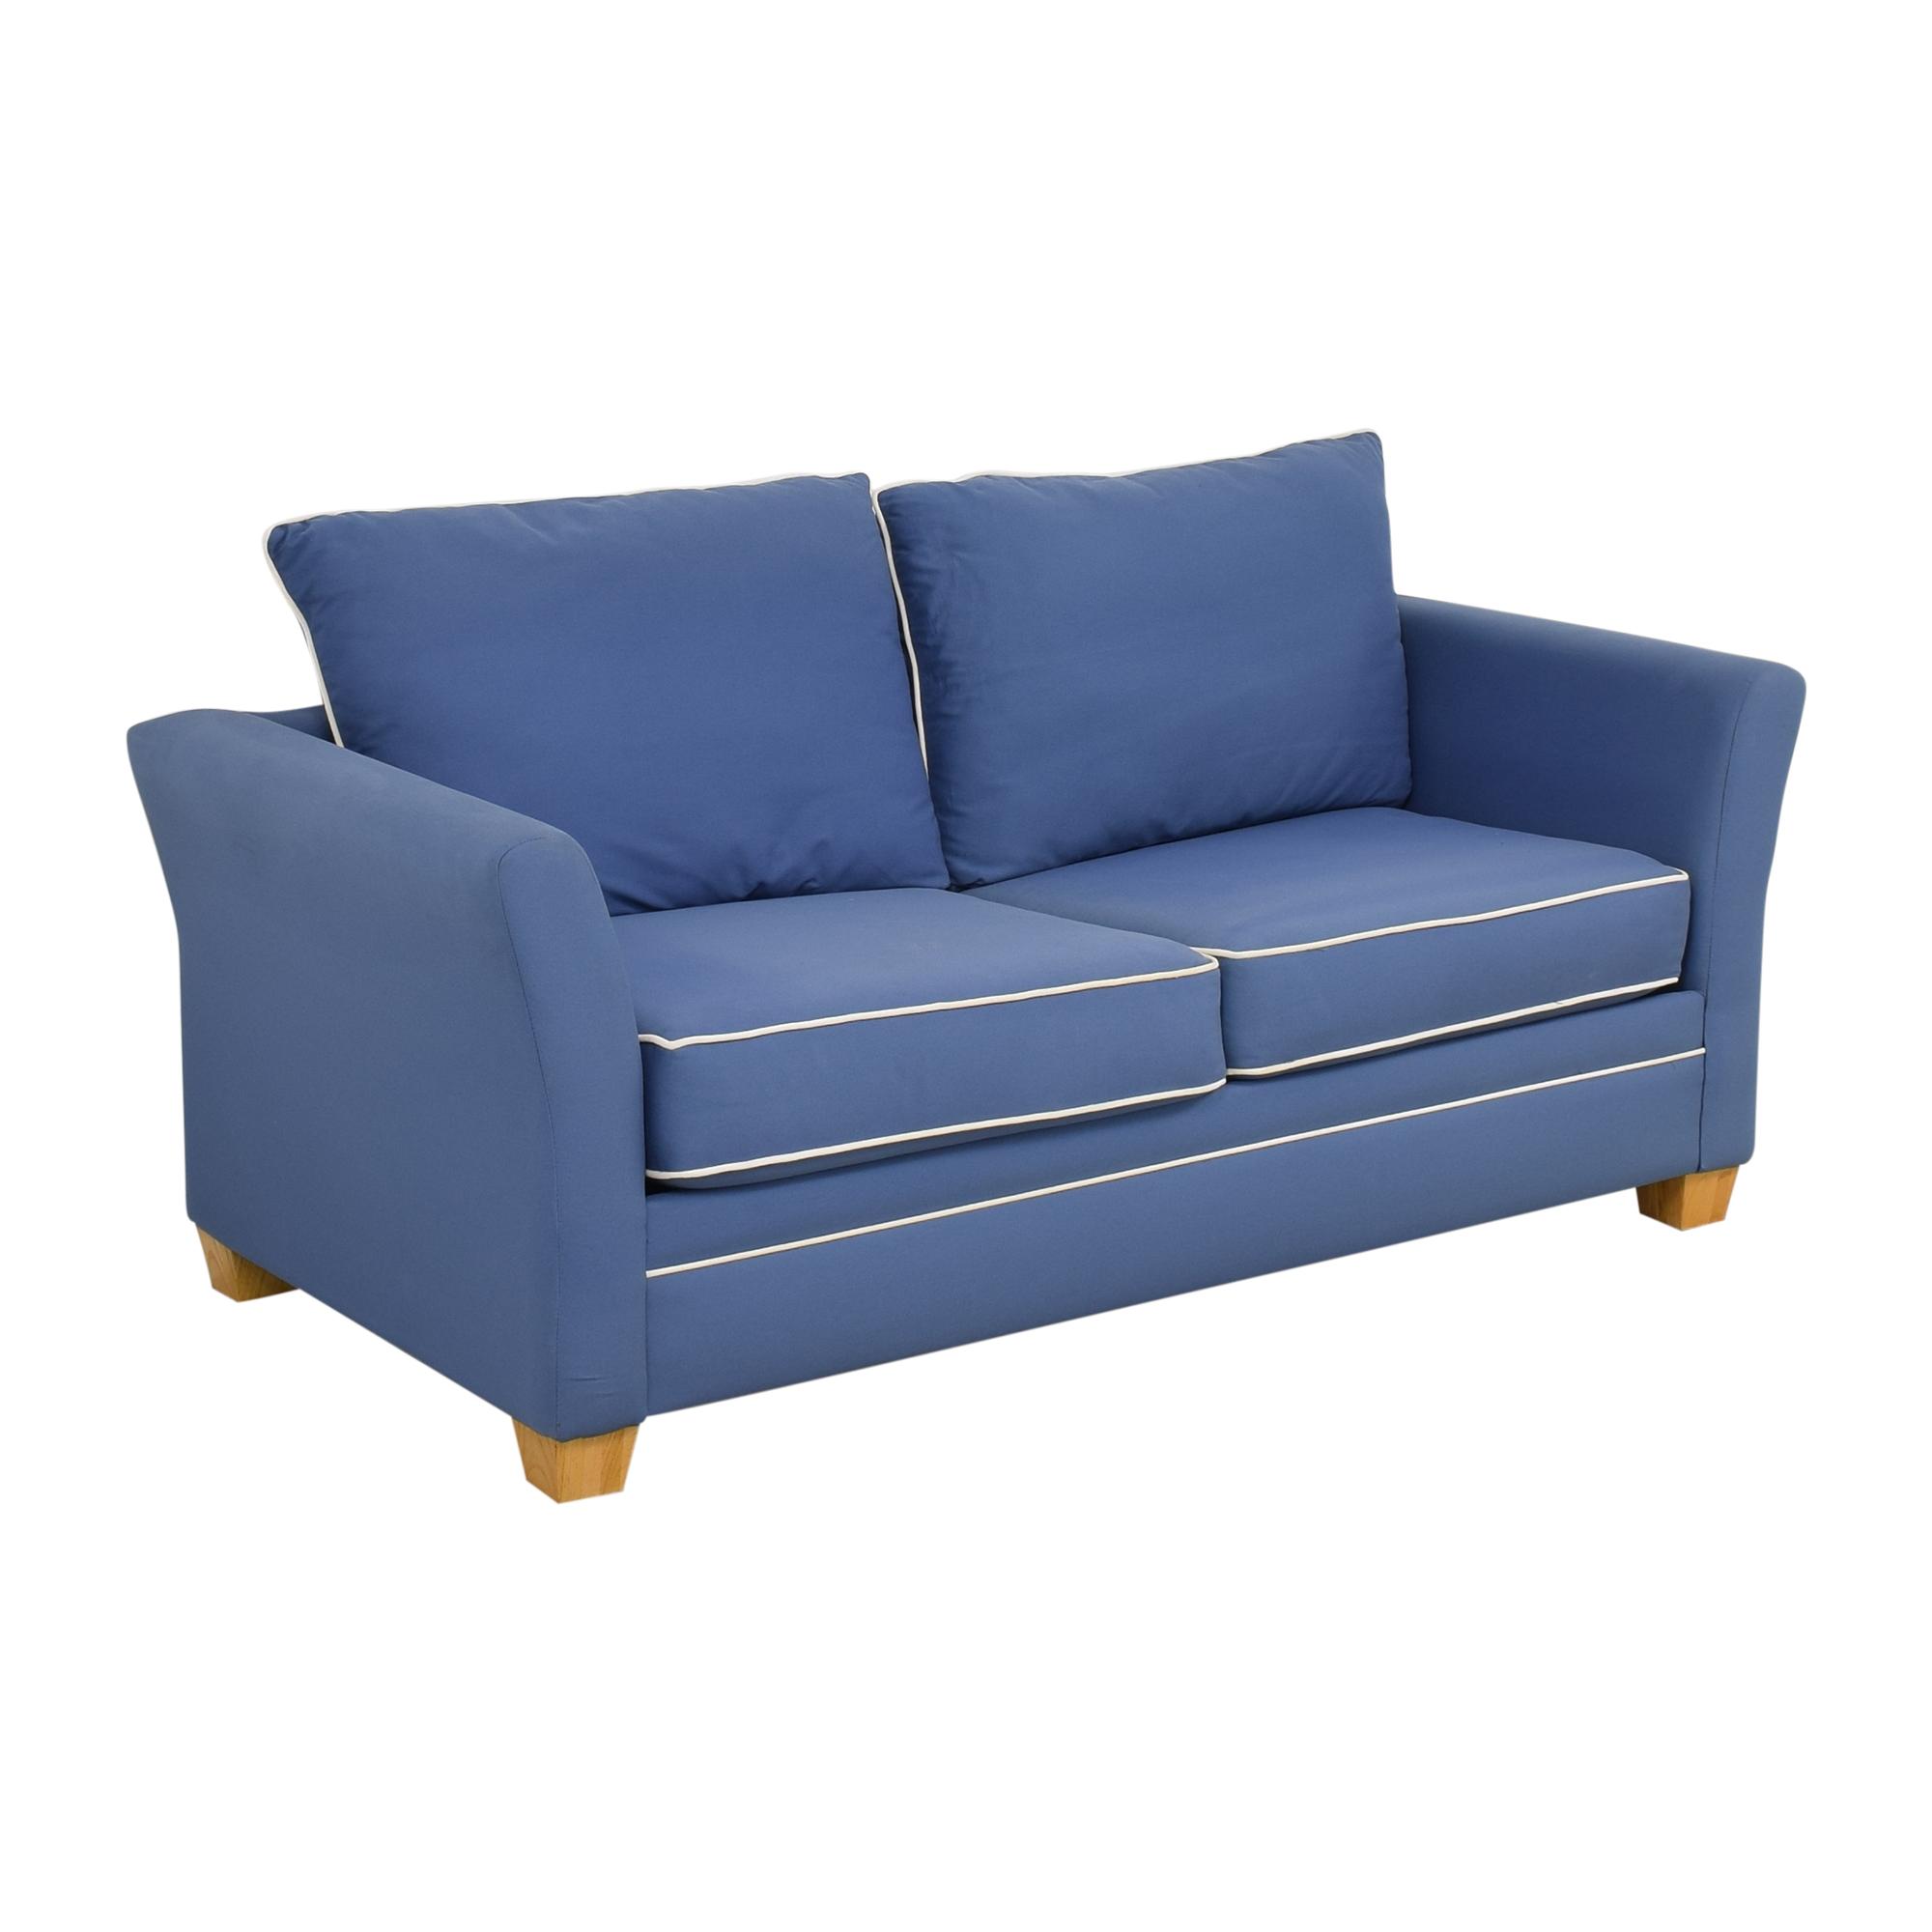 Hickory Springs Hickory Springs Sleeper Sofa used